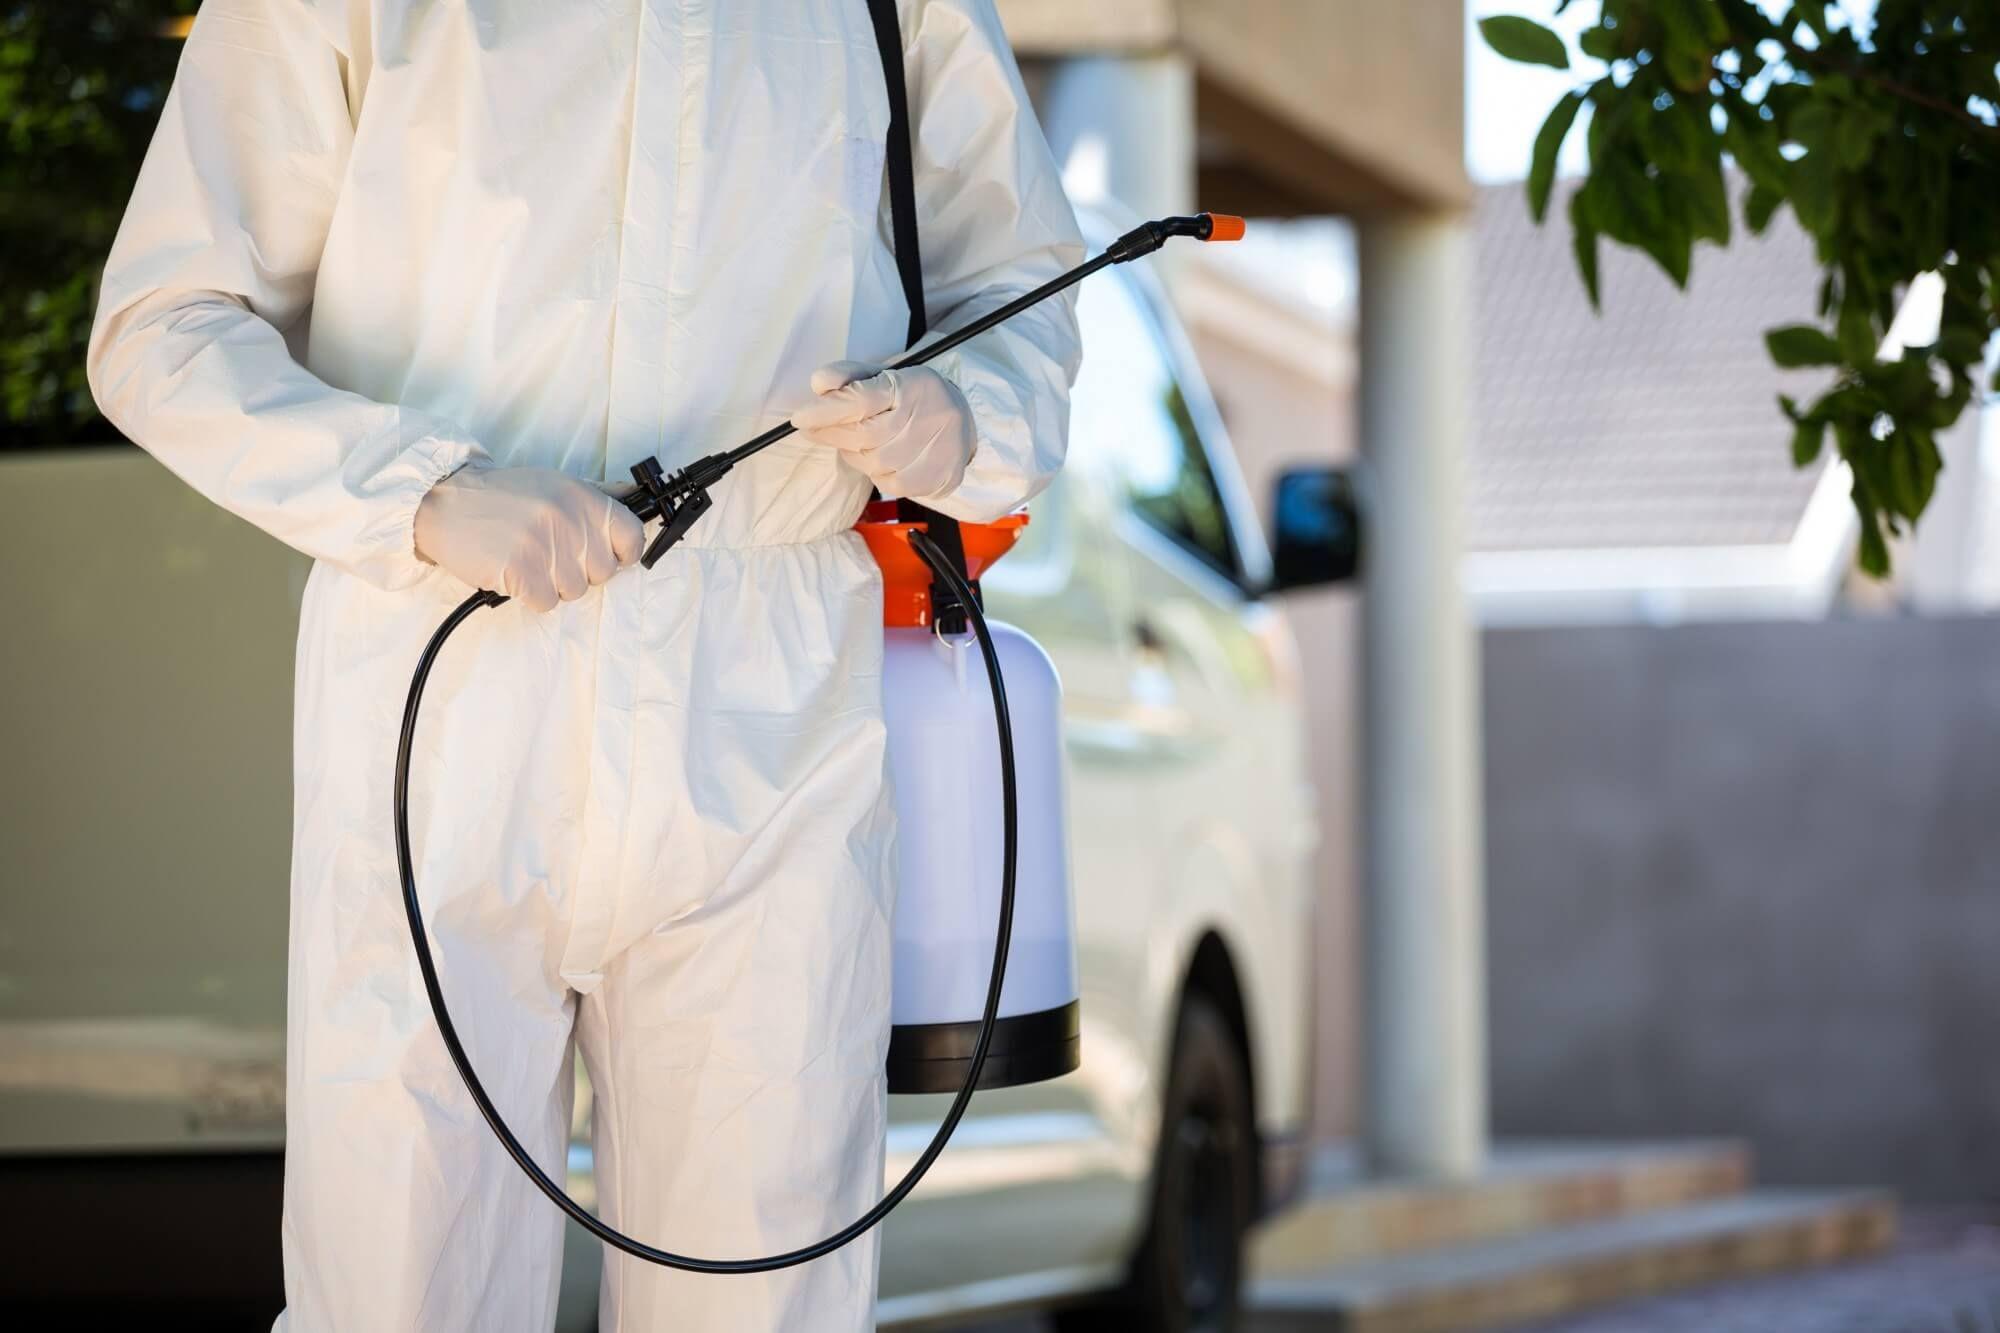 ارخص شركة مكافحة حشرات بالرياض Pest control, Termite